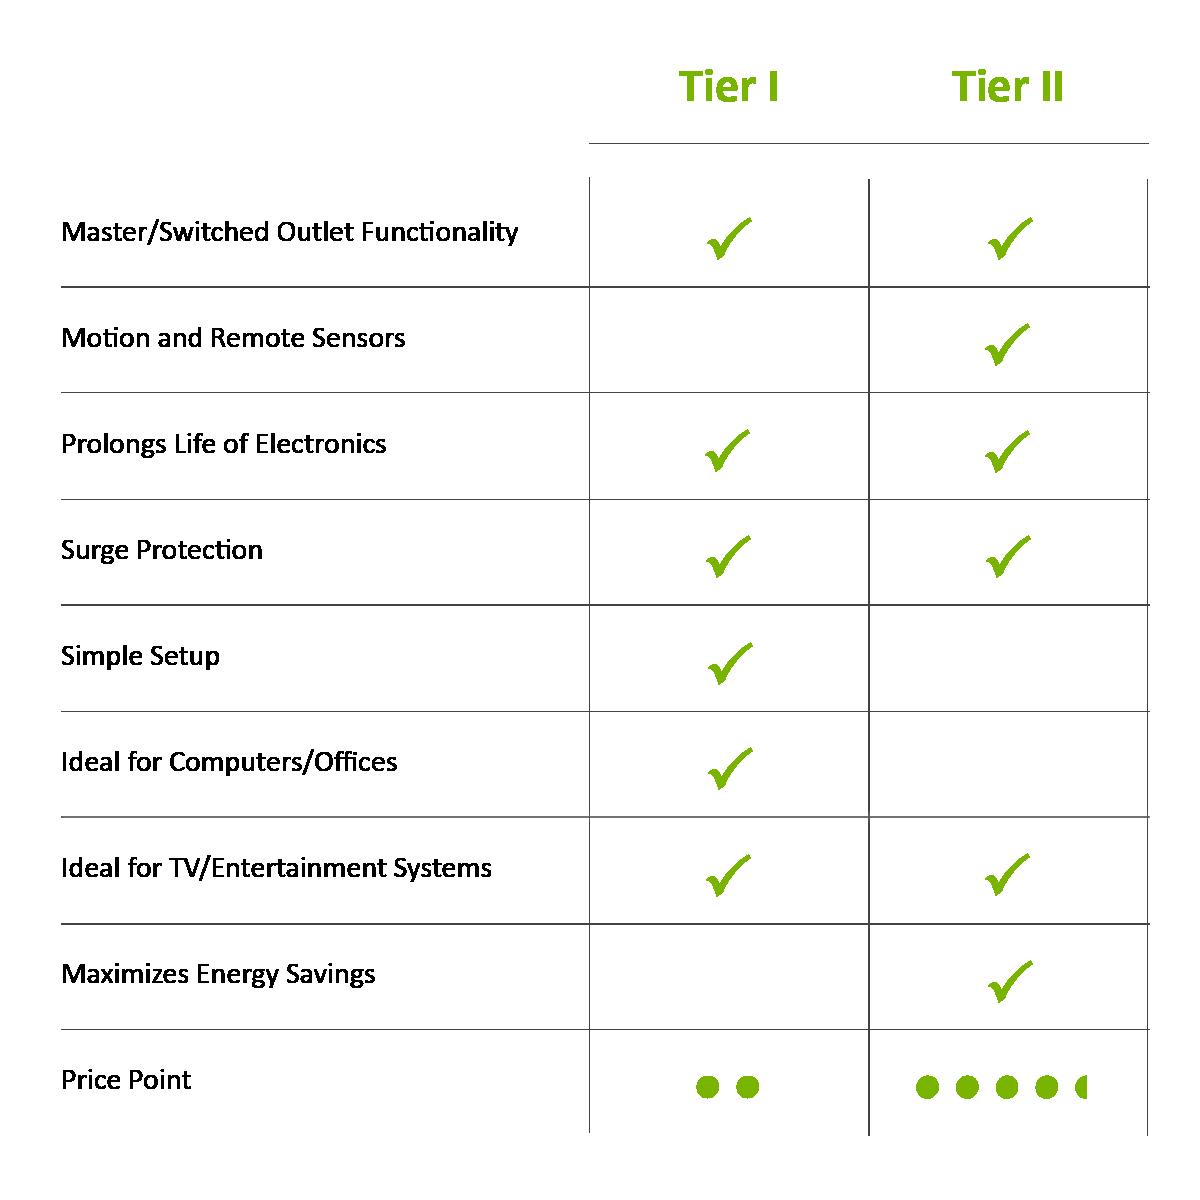 How to choose an advanced power strip. Chart comparing Tier I and Tier II advanced power strips, or smart power strips.